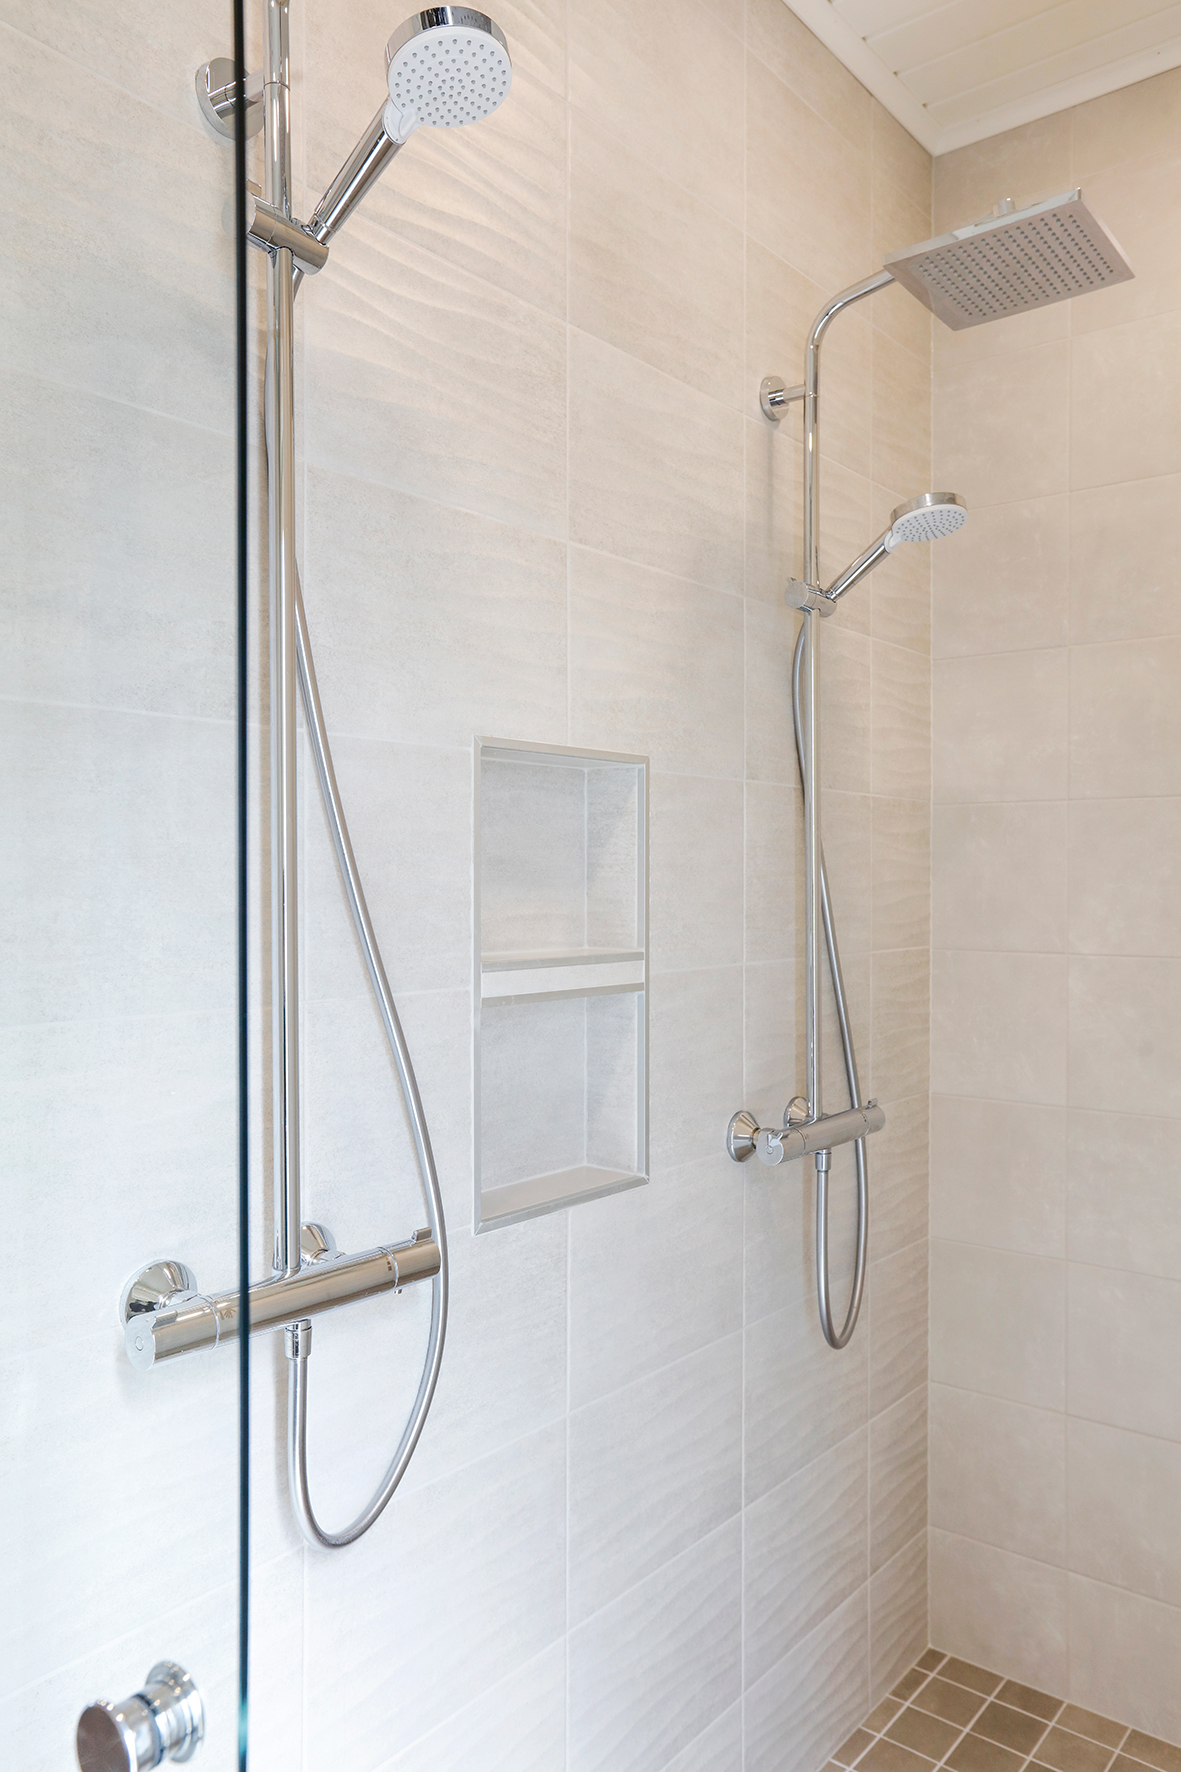 Intydds schampohylla mellan två duschar